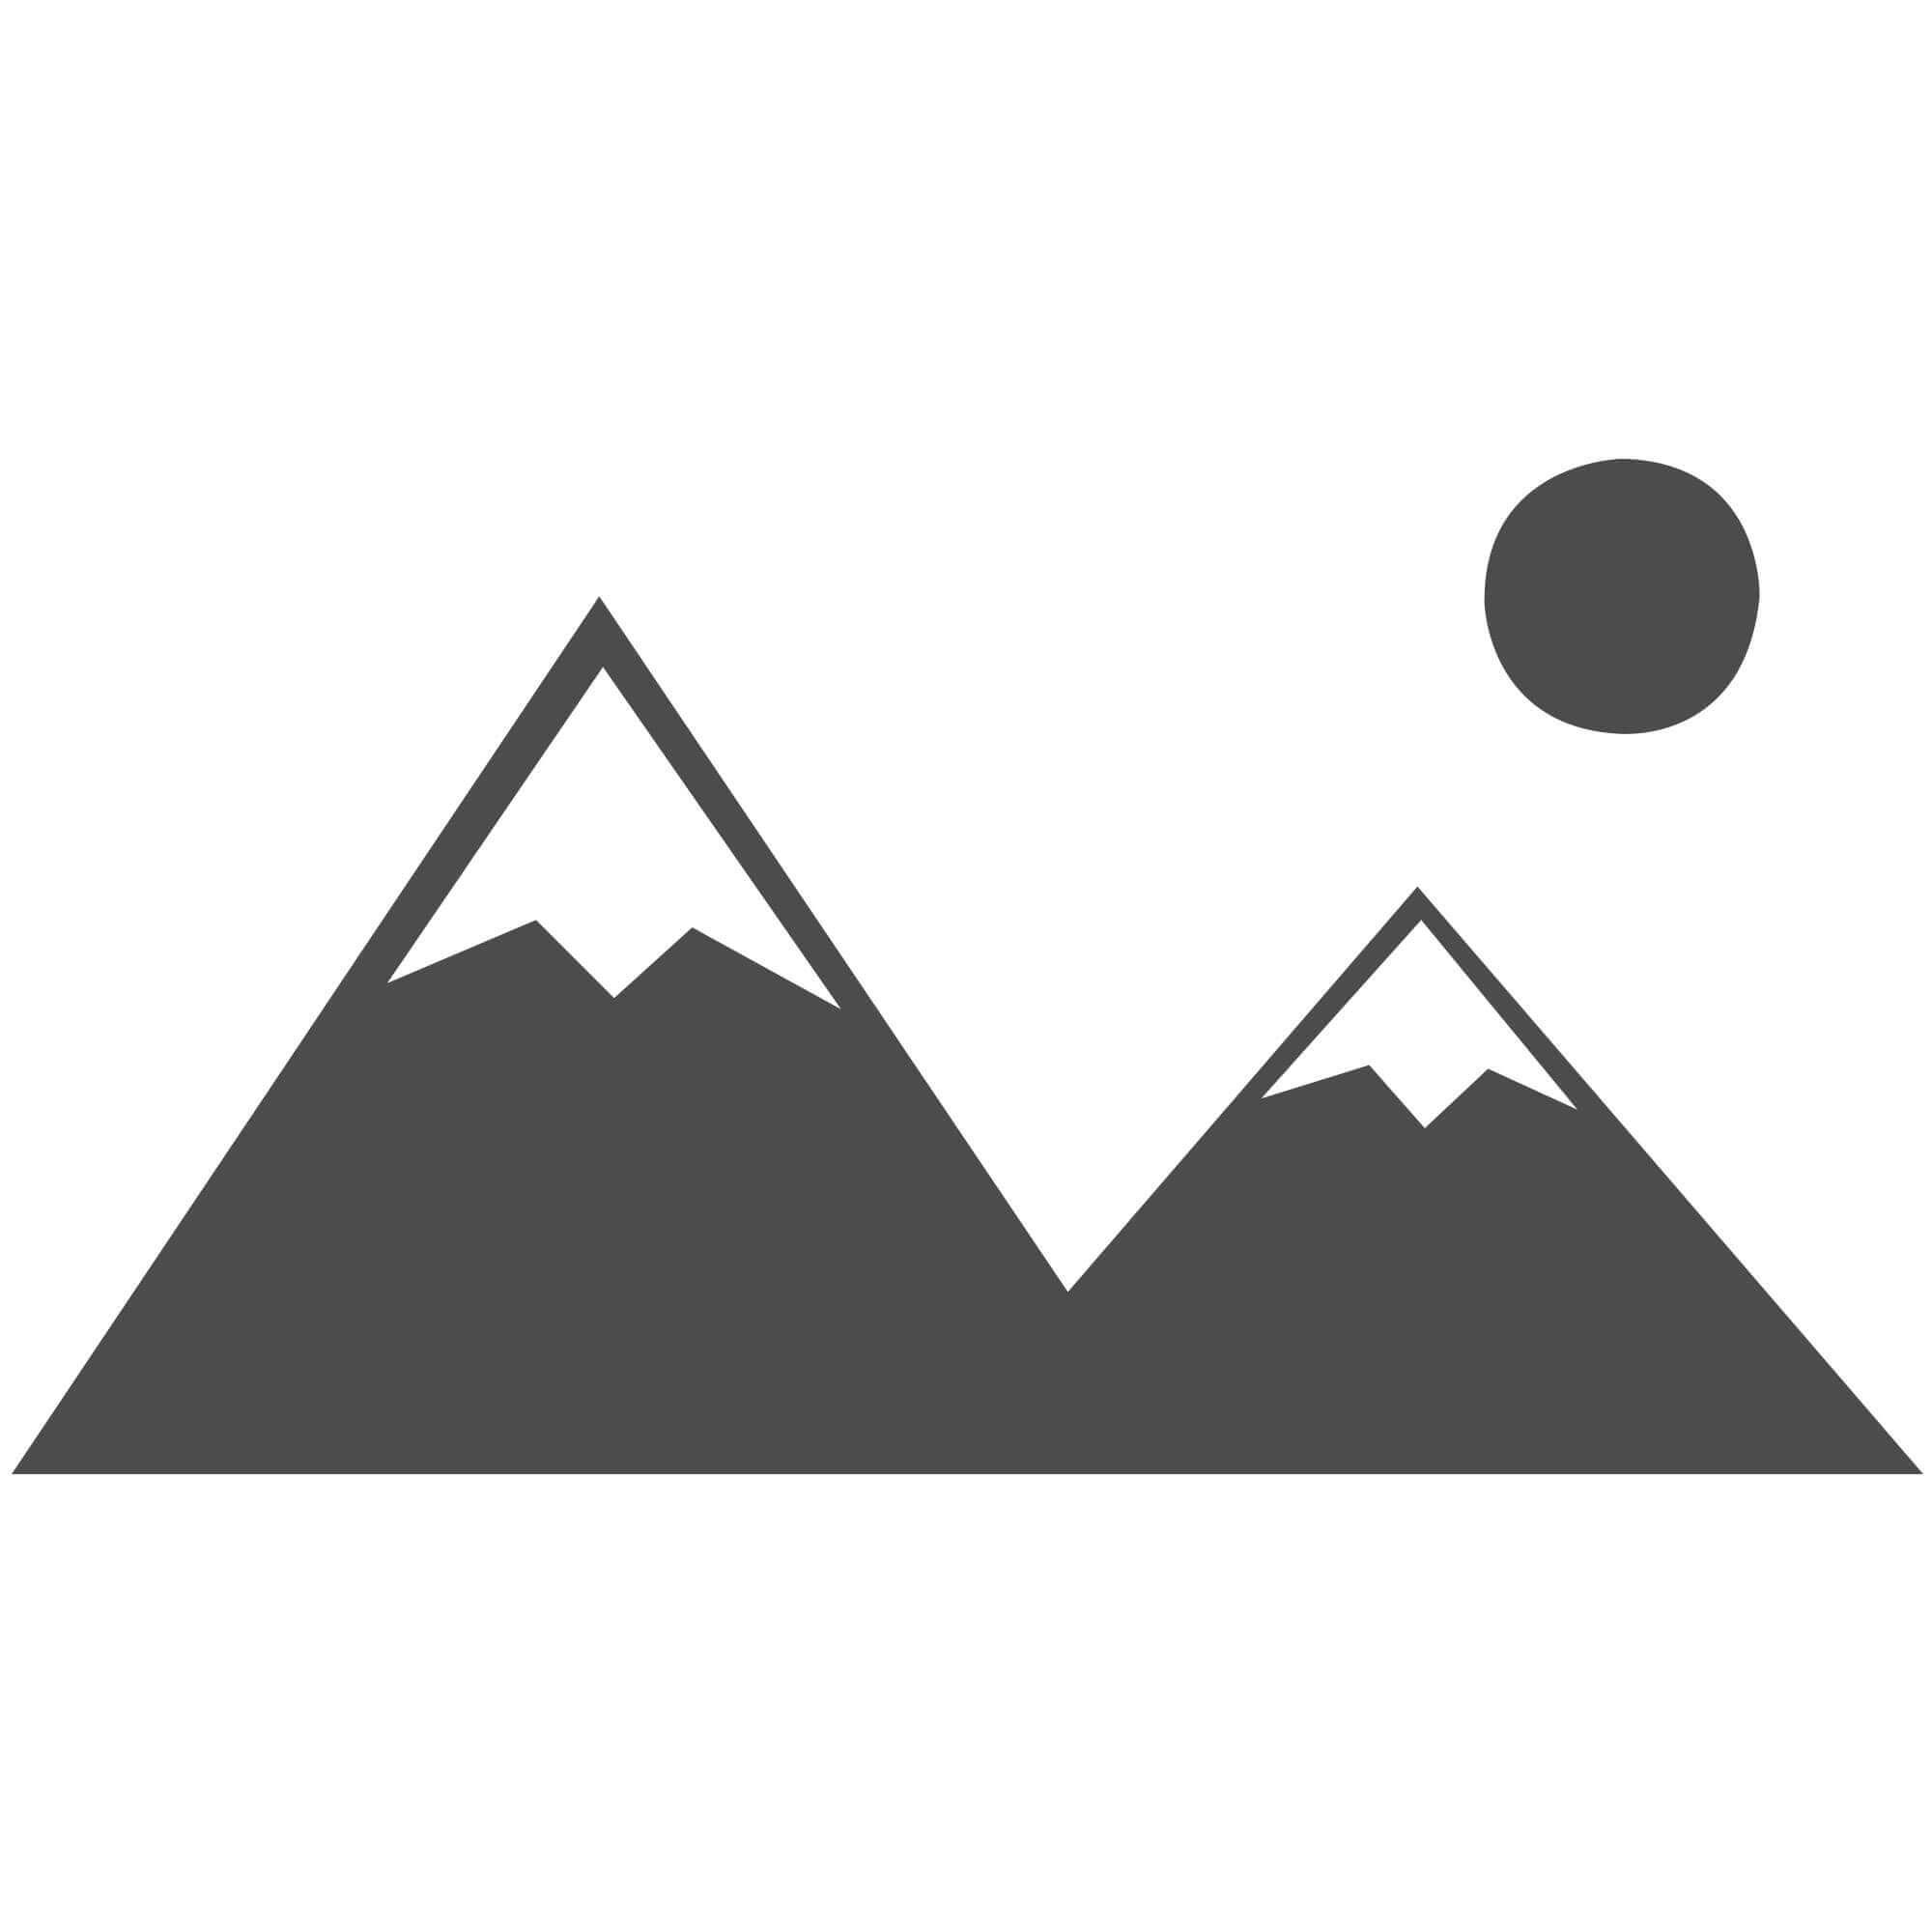 "Trend Modern Squares Wool Rug - Oatmeal-120 x 170 cm (4' x 5'7"")"